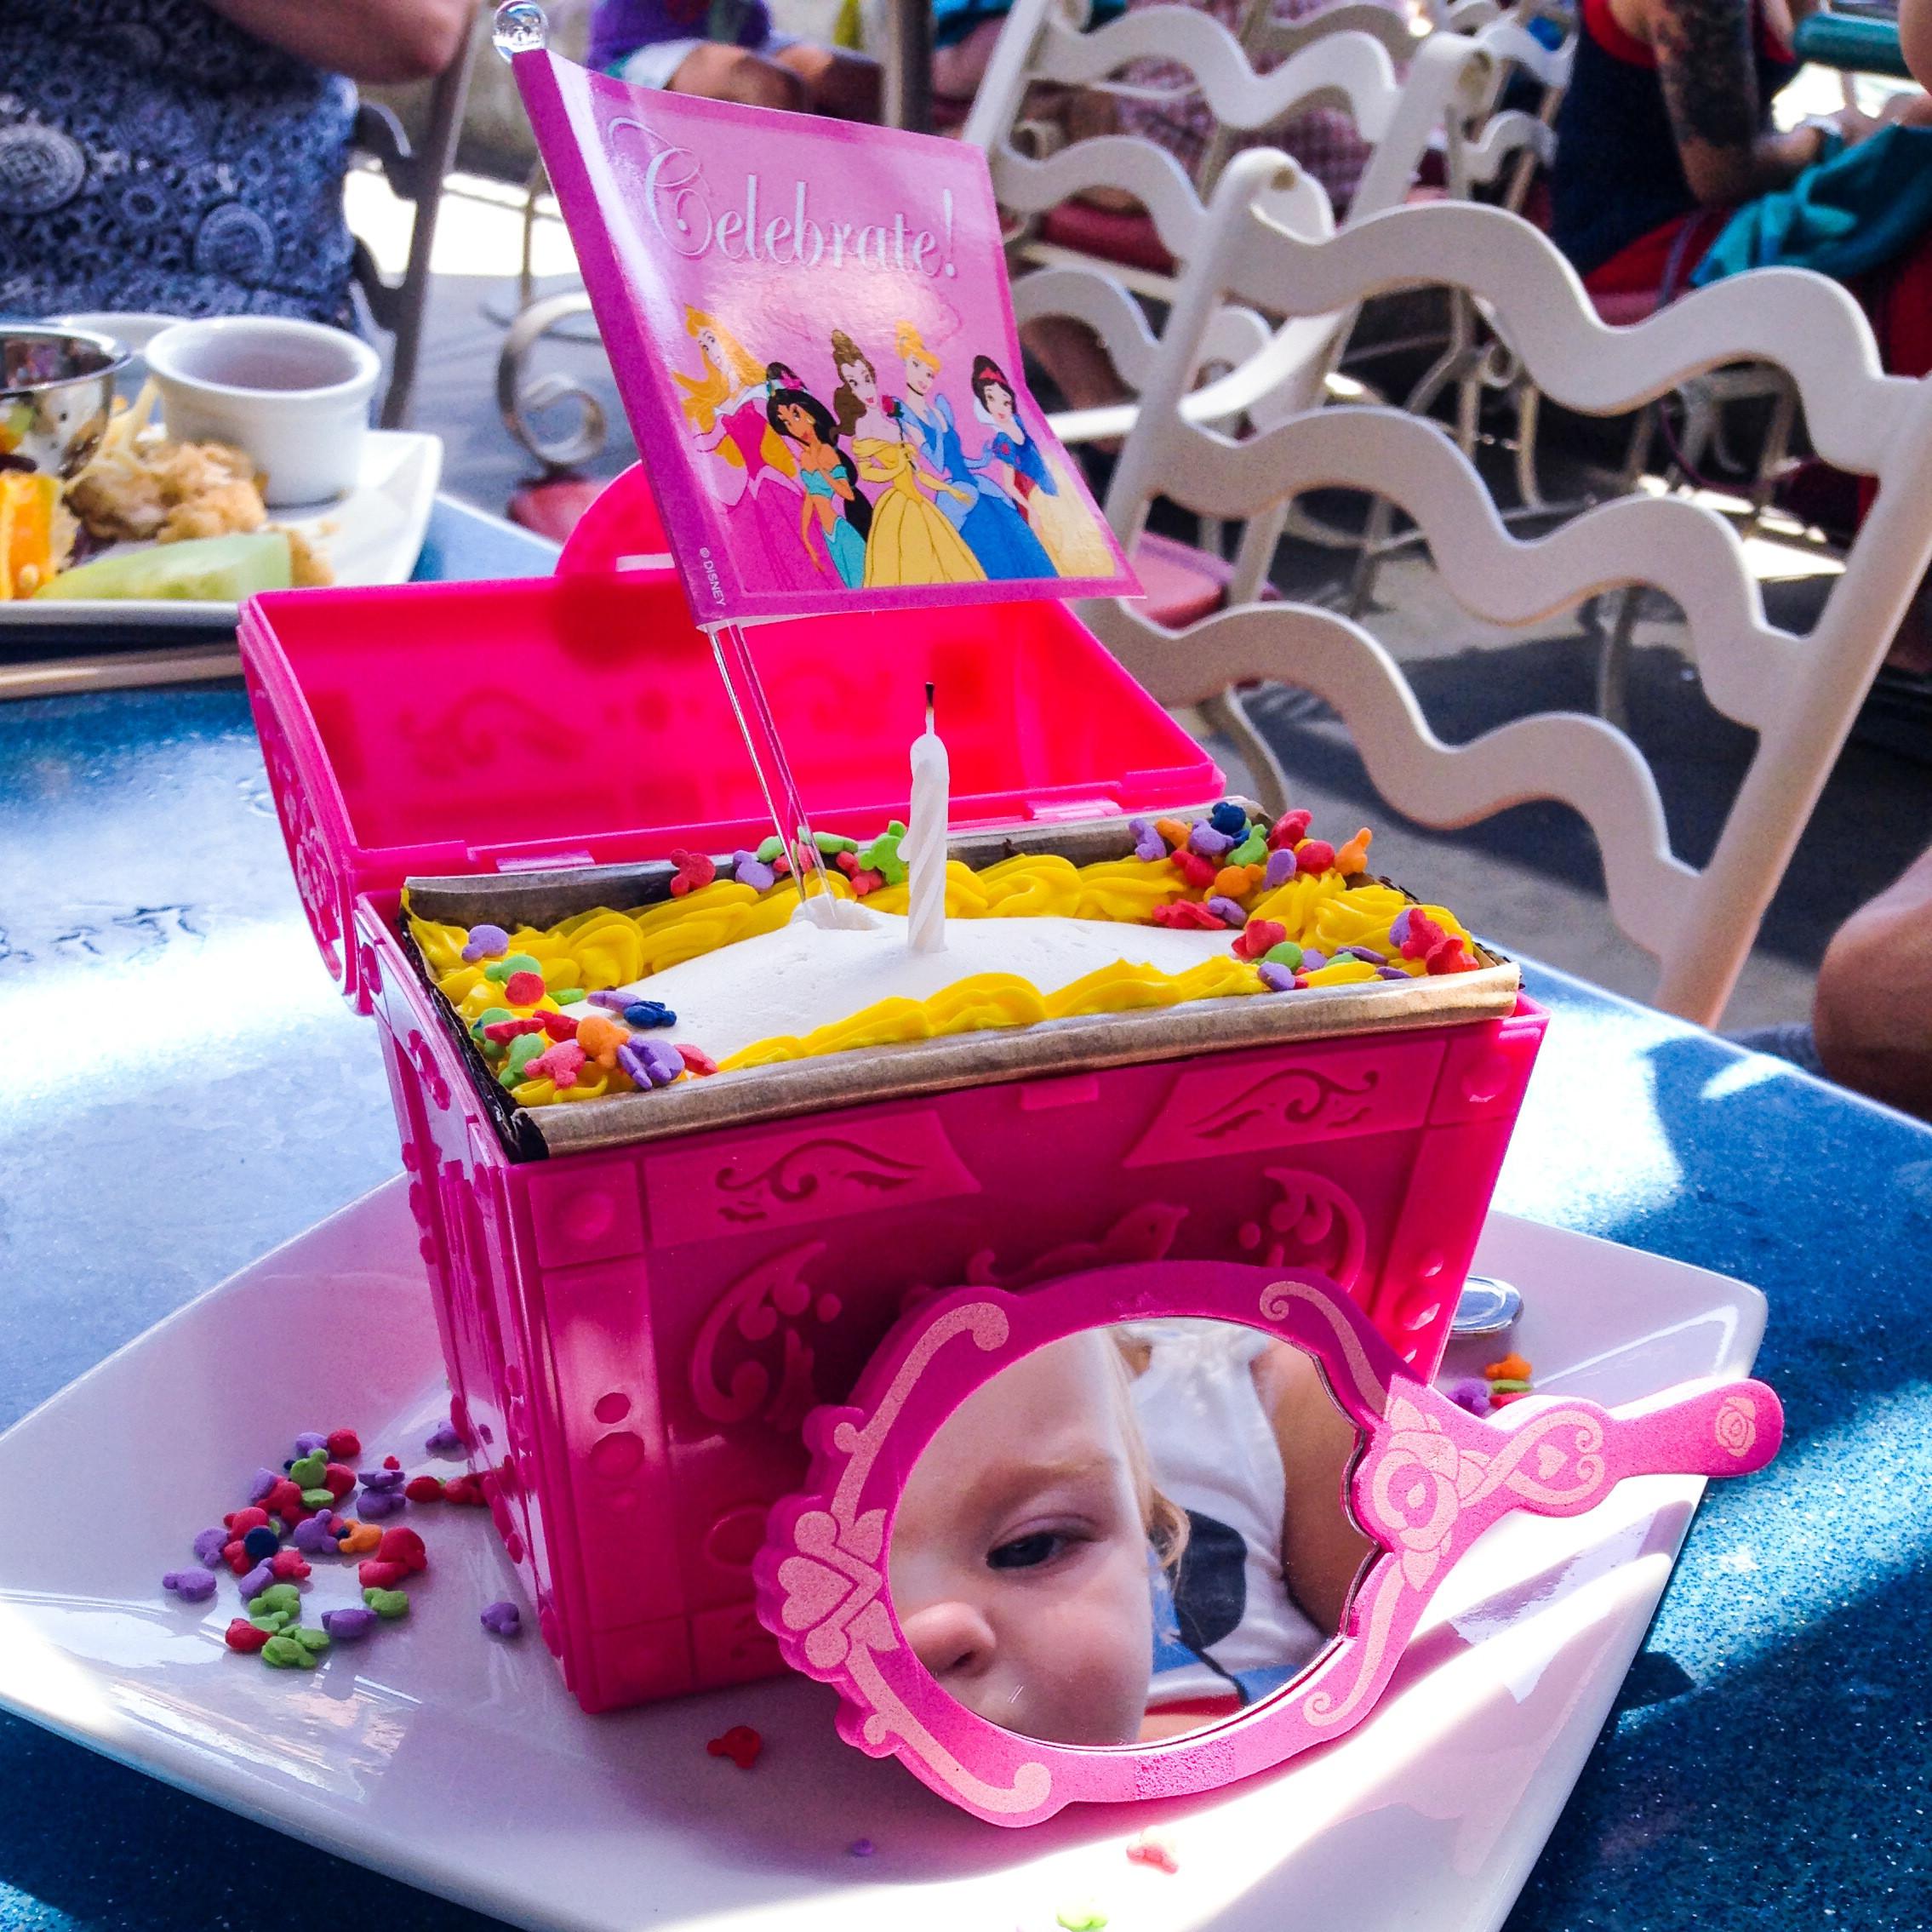 Best ideas about Disneyland Birthday Cake . Save or Pin Baby's first birthday at Disneyland Now.